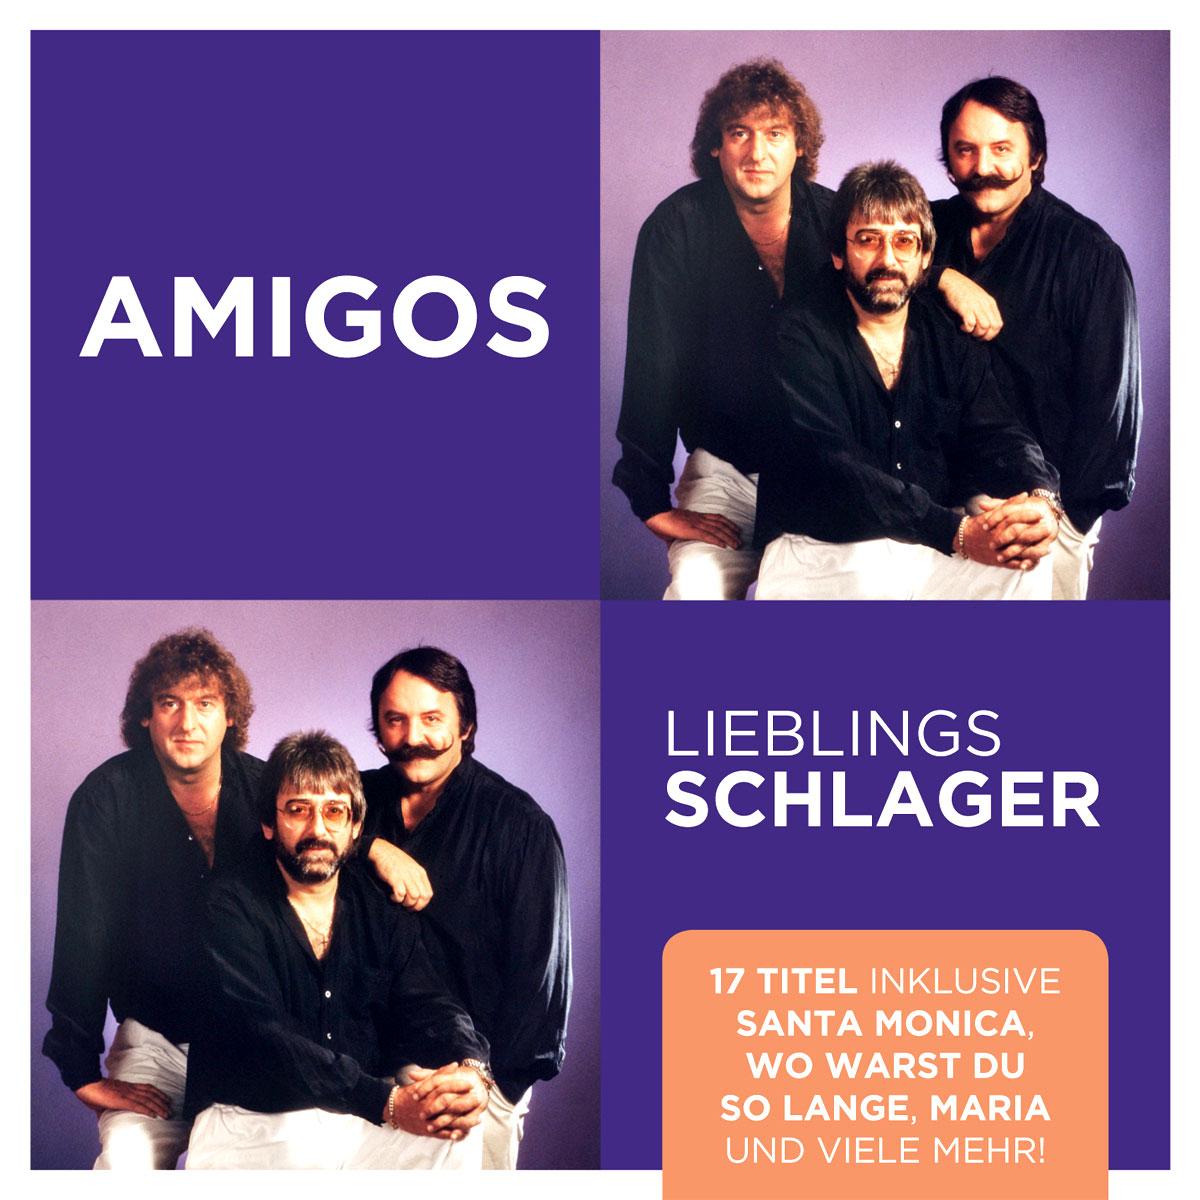 AMIGOS – LIEBLINGSSCHLAGER